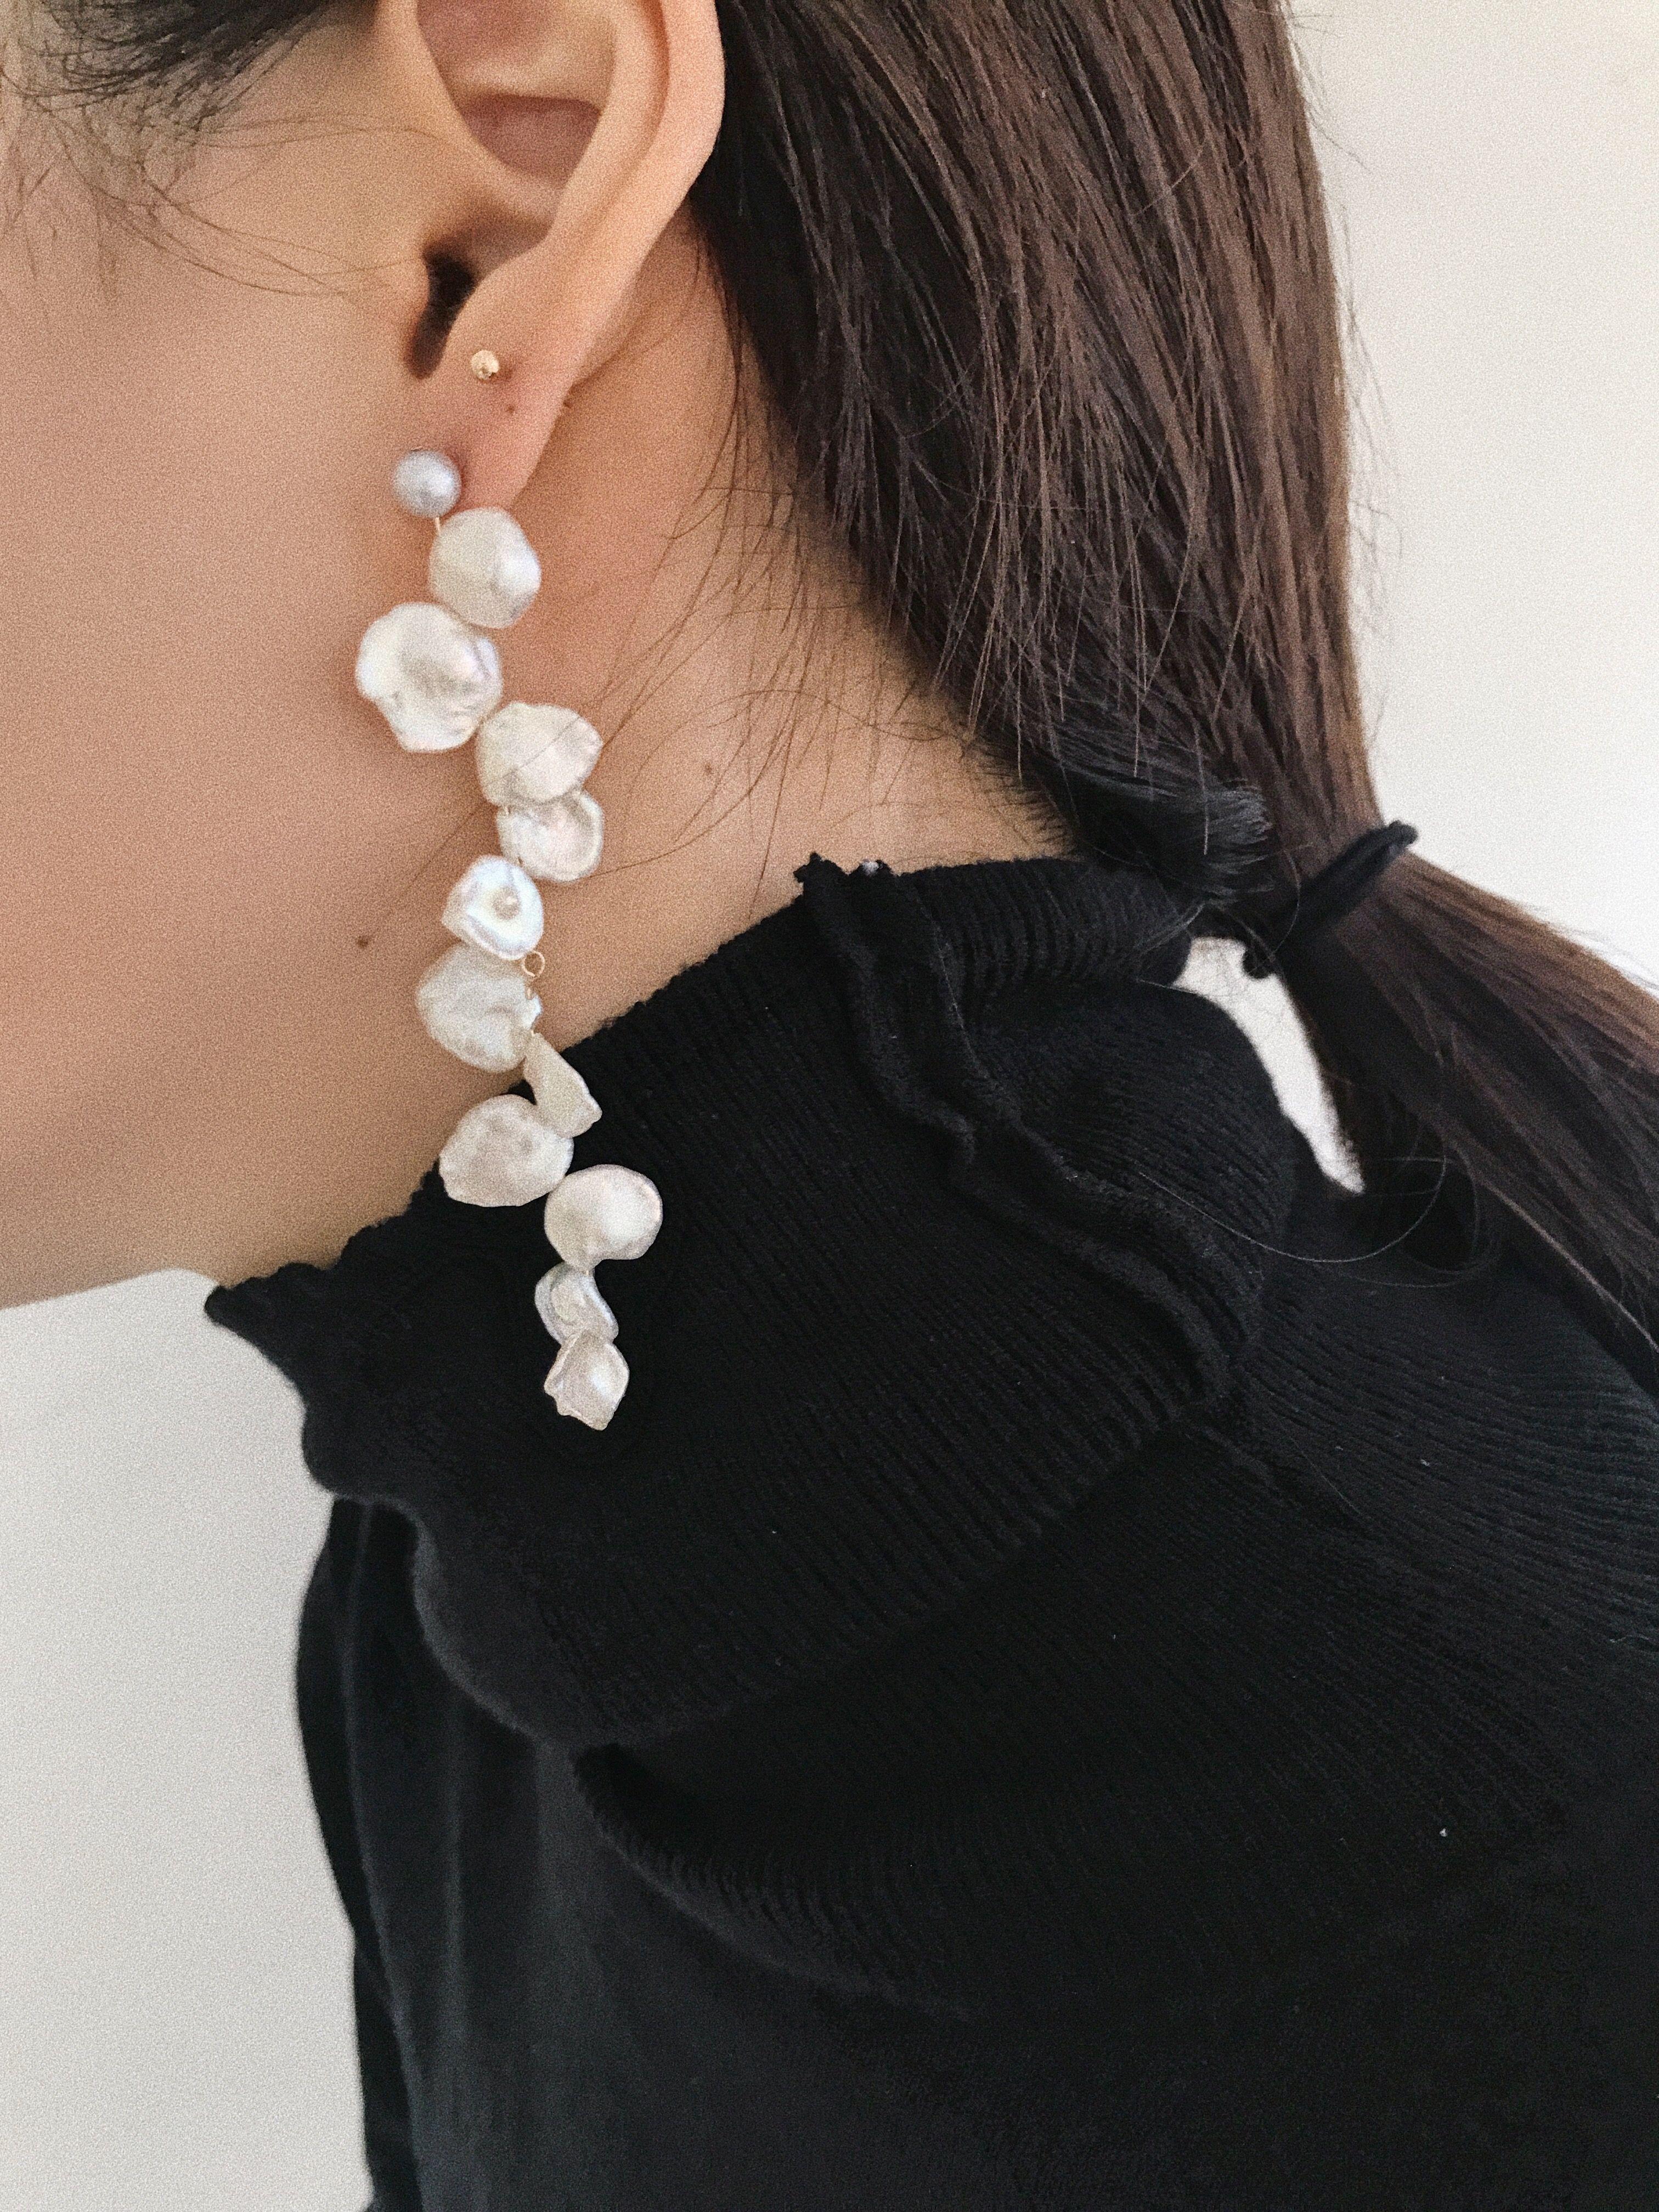 LESIS, 珍珠, 金屬, 鉚釘, 配件, 飾品, 穿搭, 小資女, 優雅, 平價